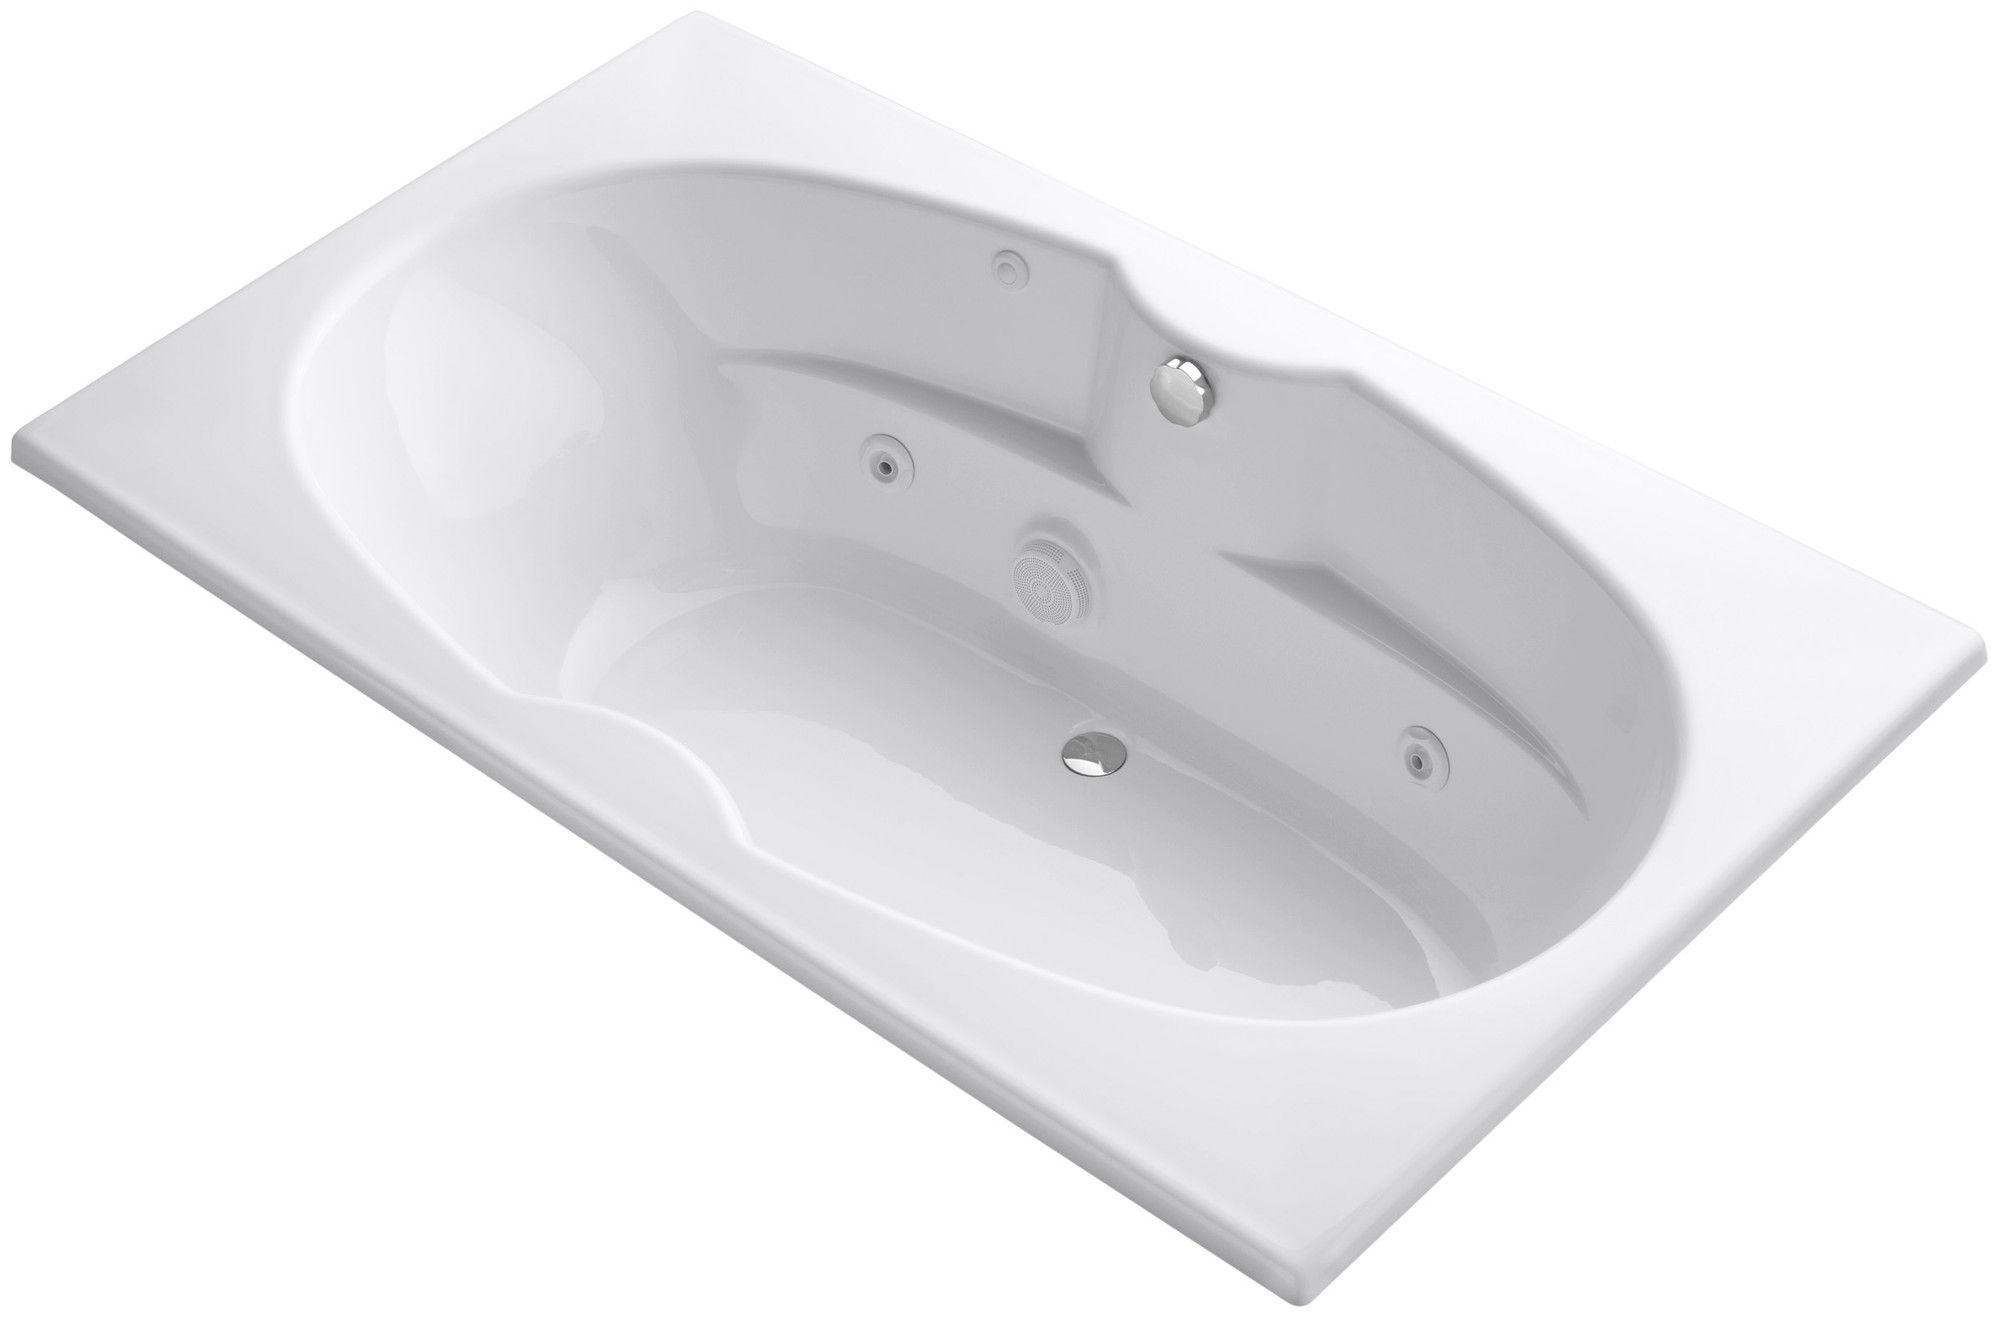 Proflex 72 X 42 Whirlpool Bathtub With Images Whirlpool Tub Whirlpool Bath Bathtub